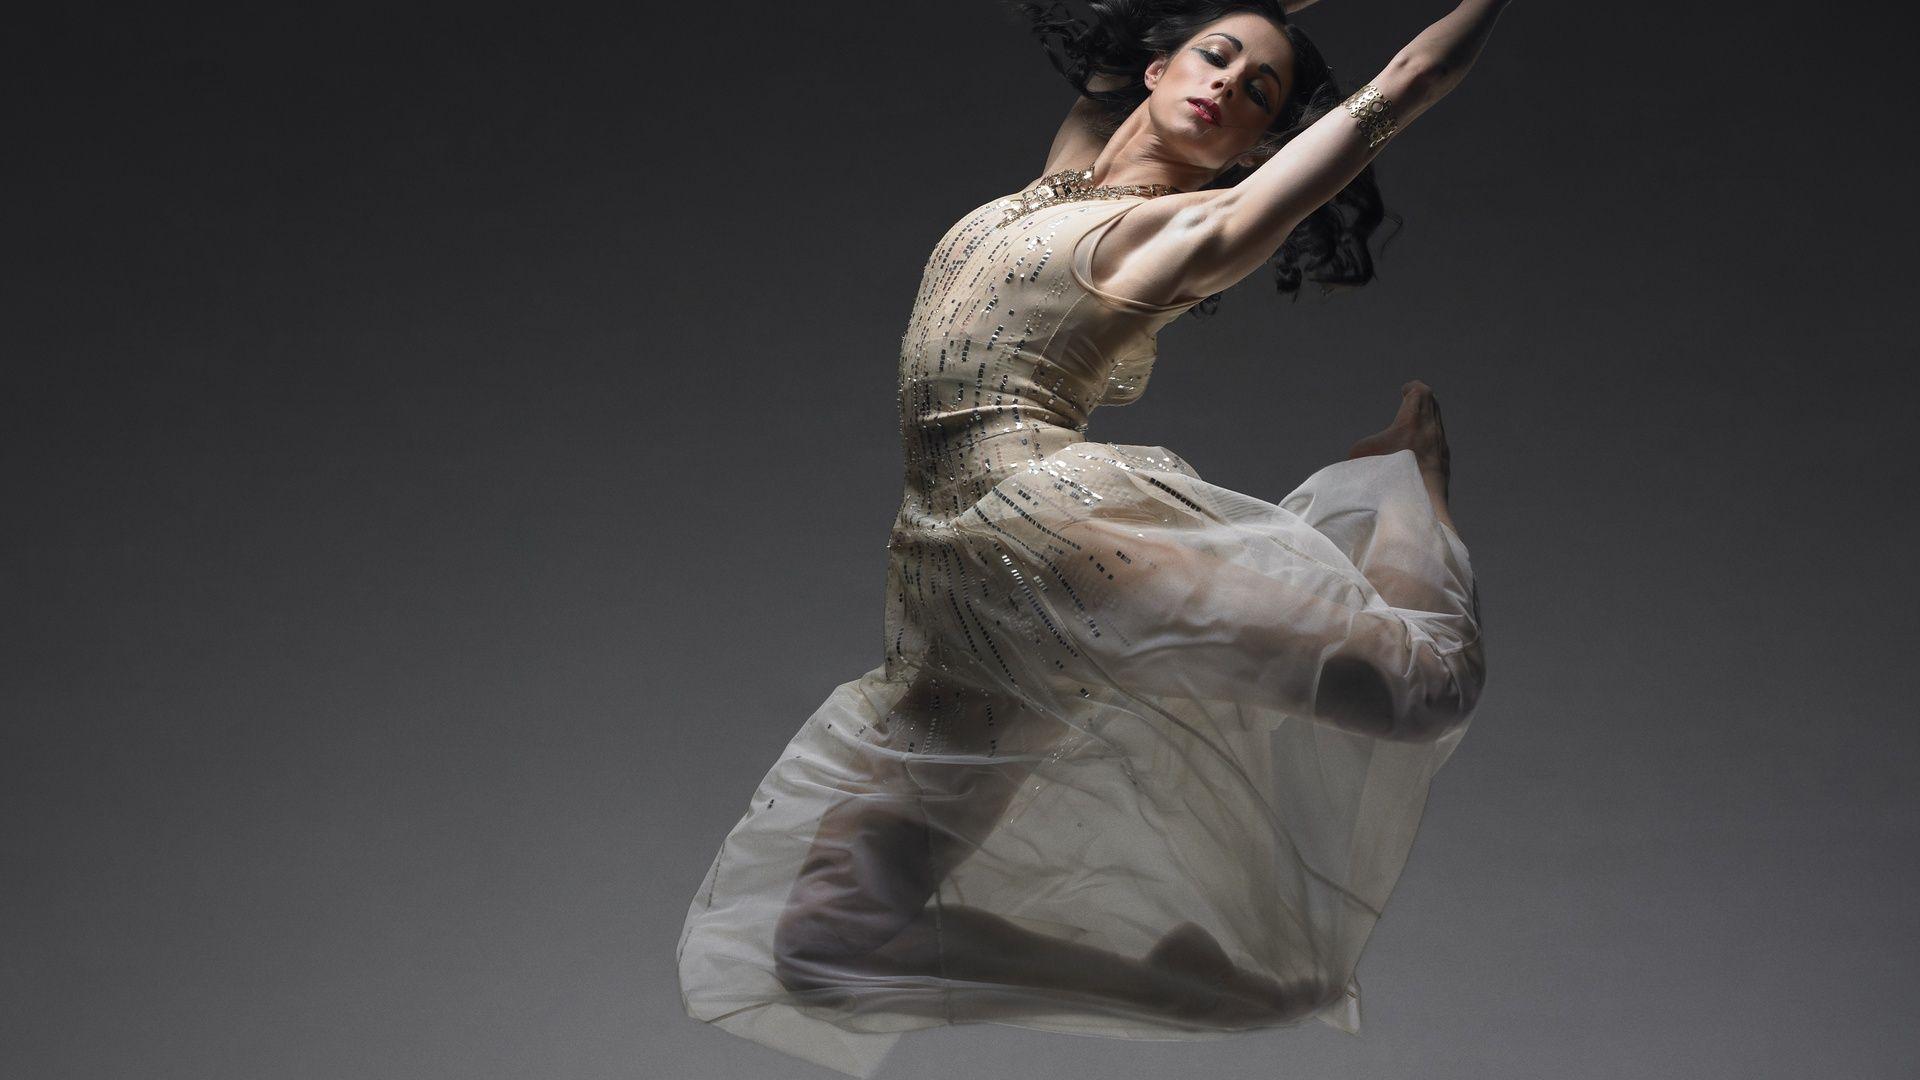 Dance hd wallpaper 1080